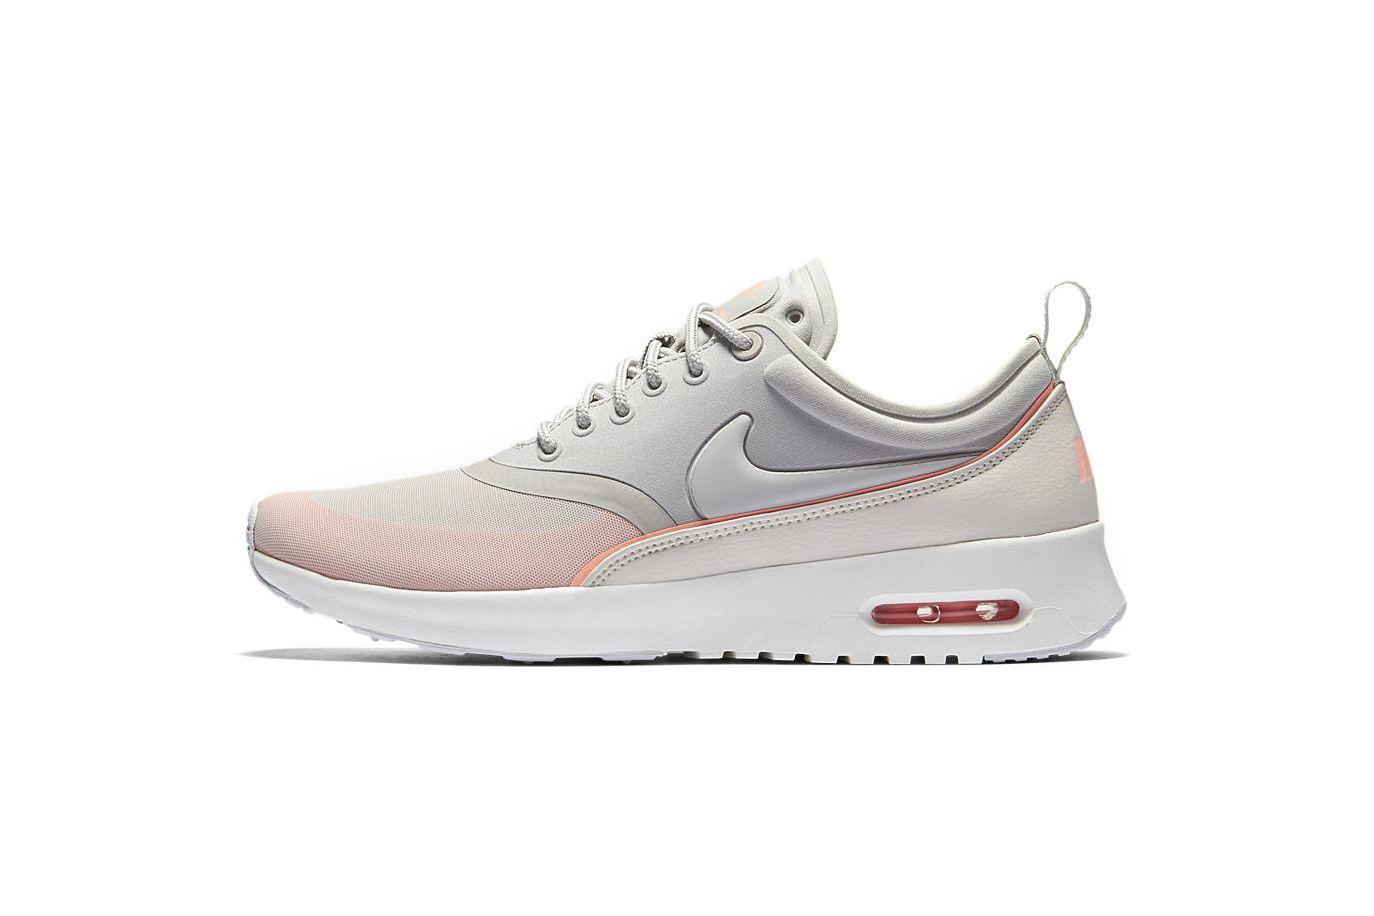 Nike Flavors Air Max Thea Ultra in Peaches and Cream | Nike